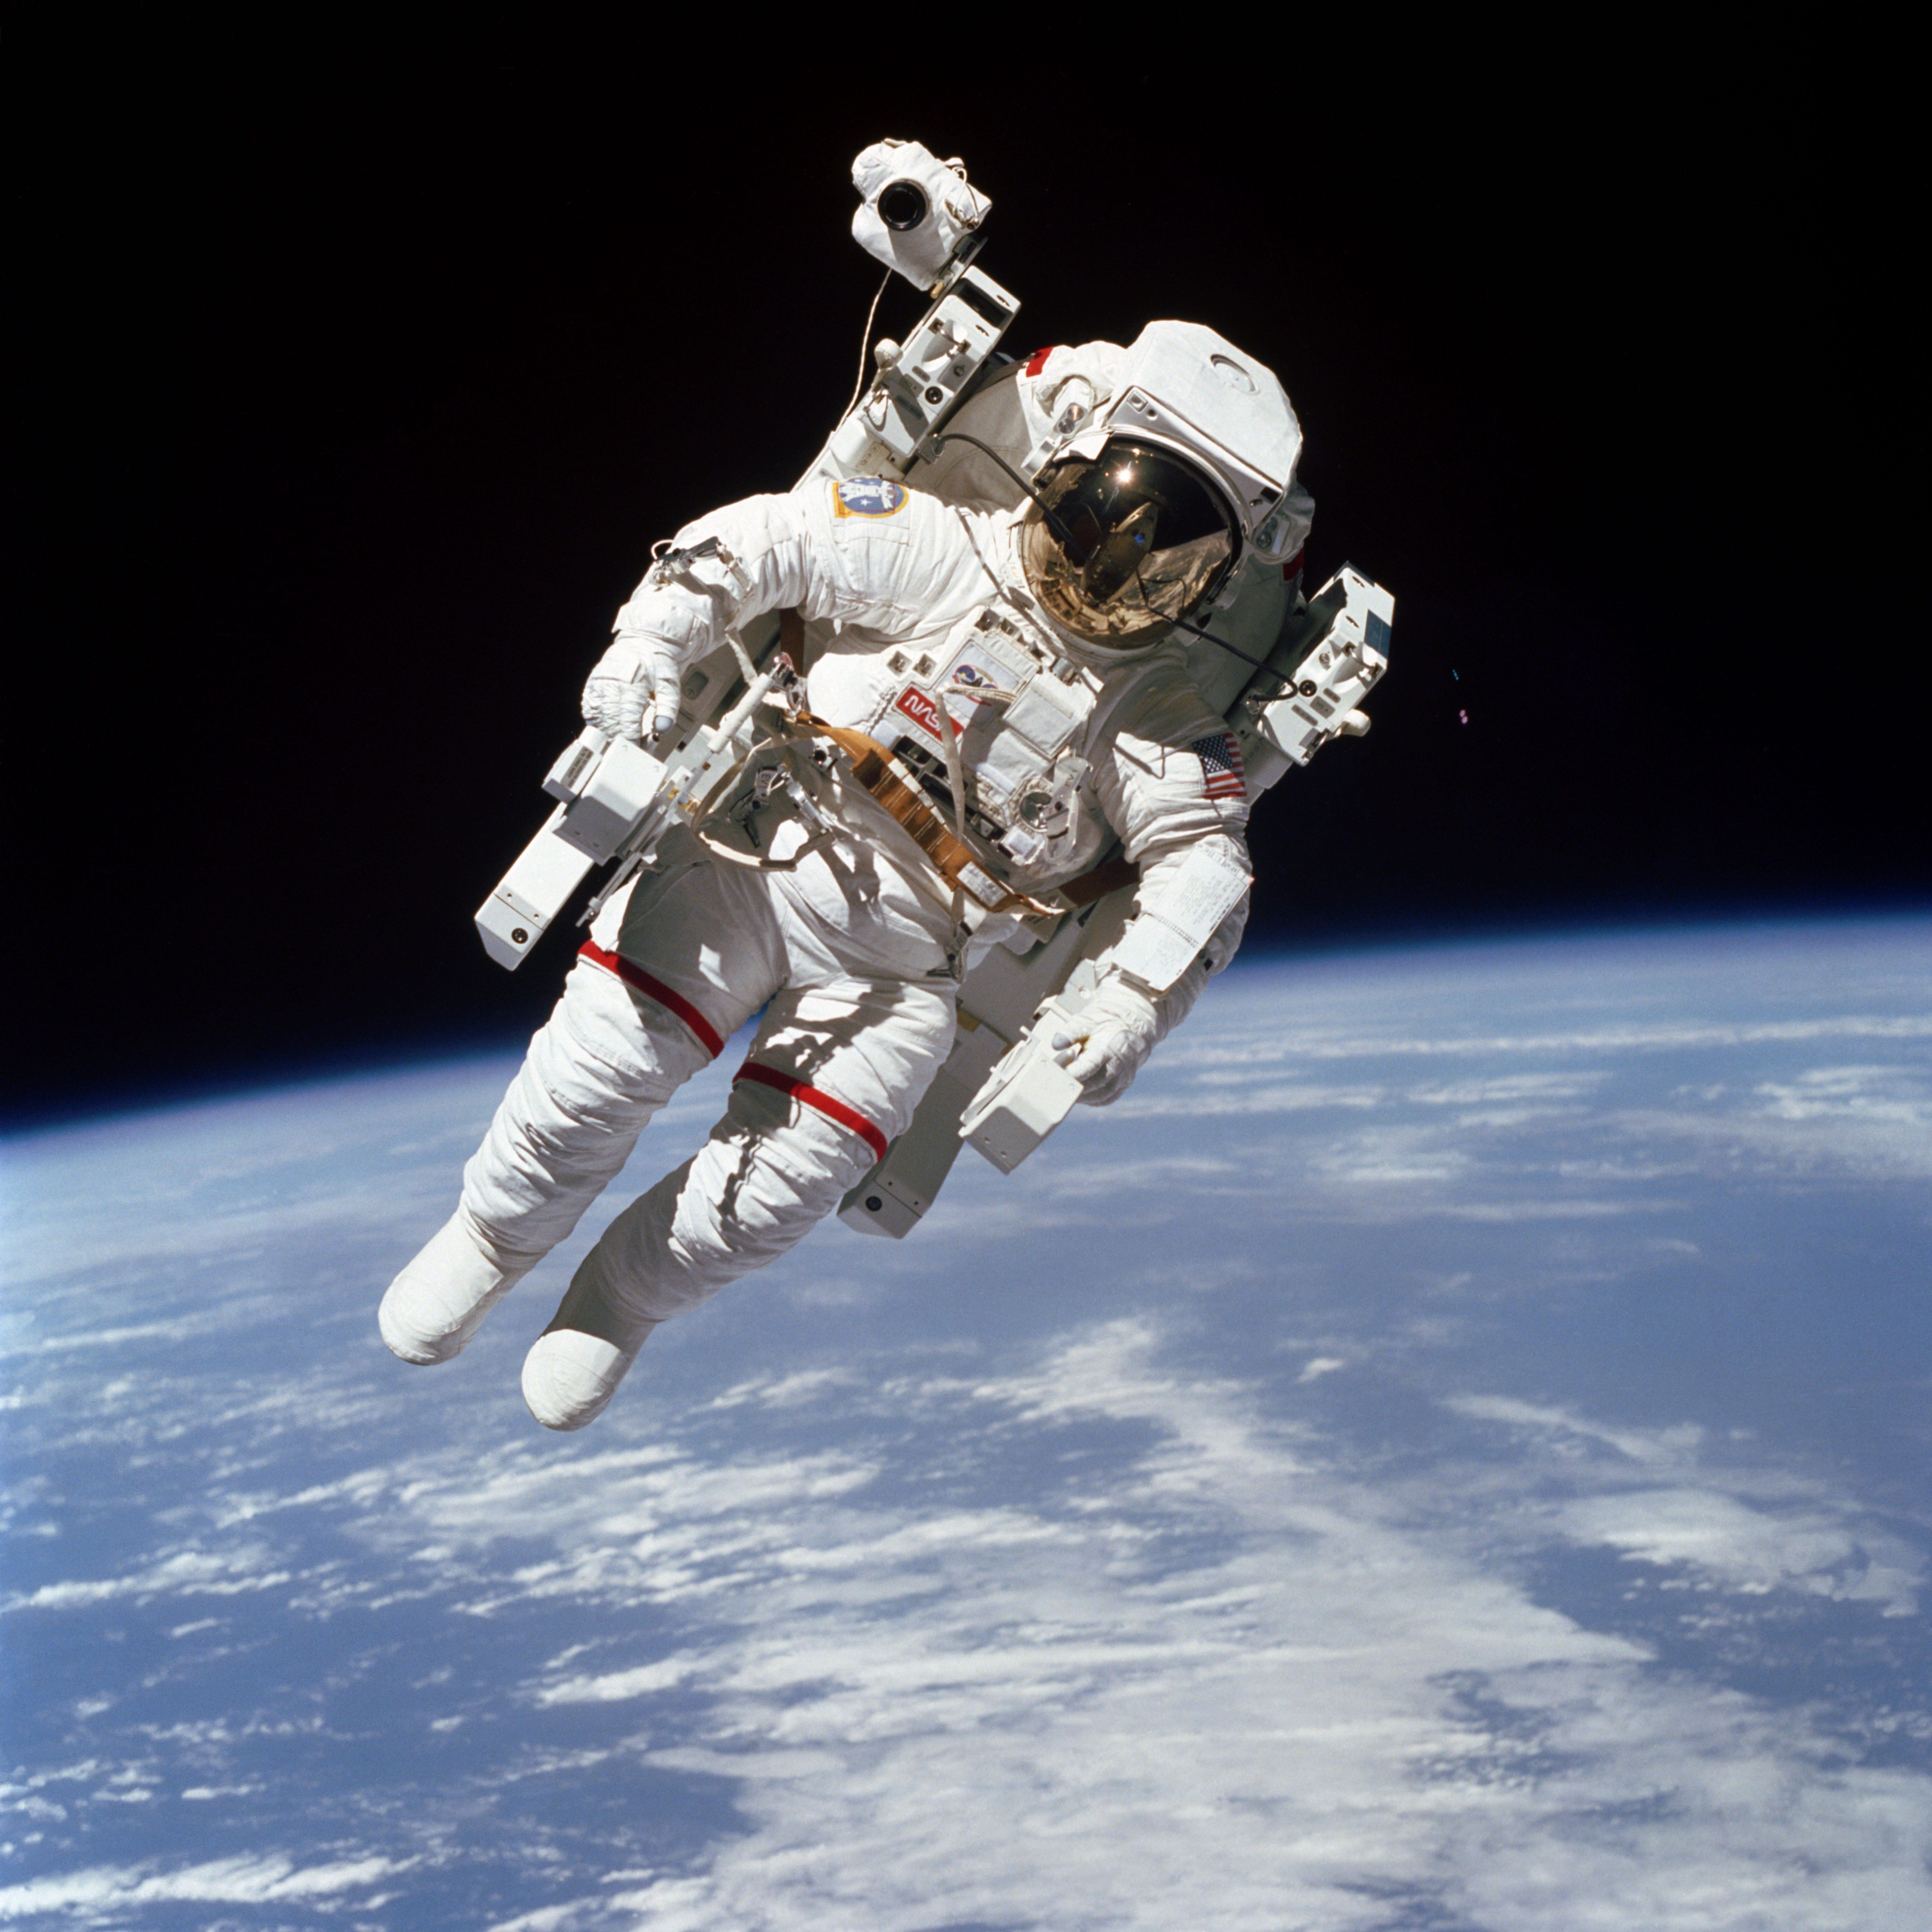 WATCH LIVE: NASA astronauts take first spacewalk of 2019